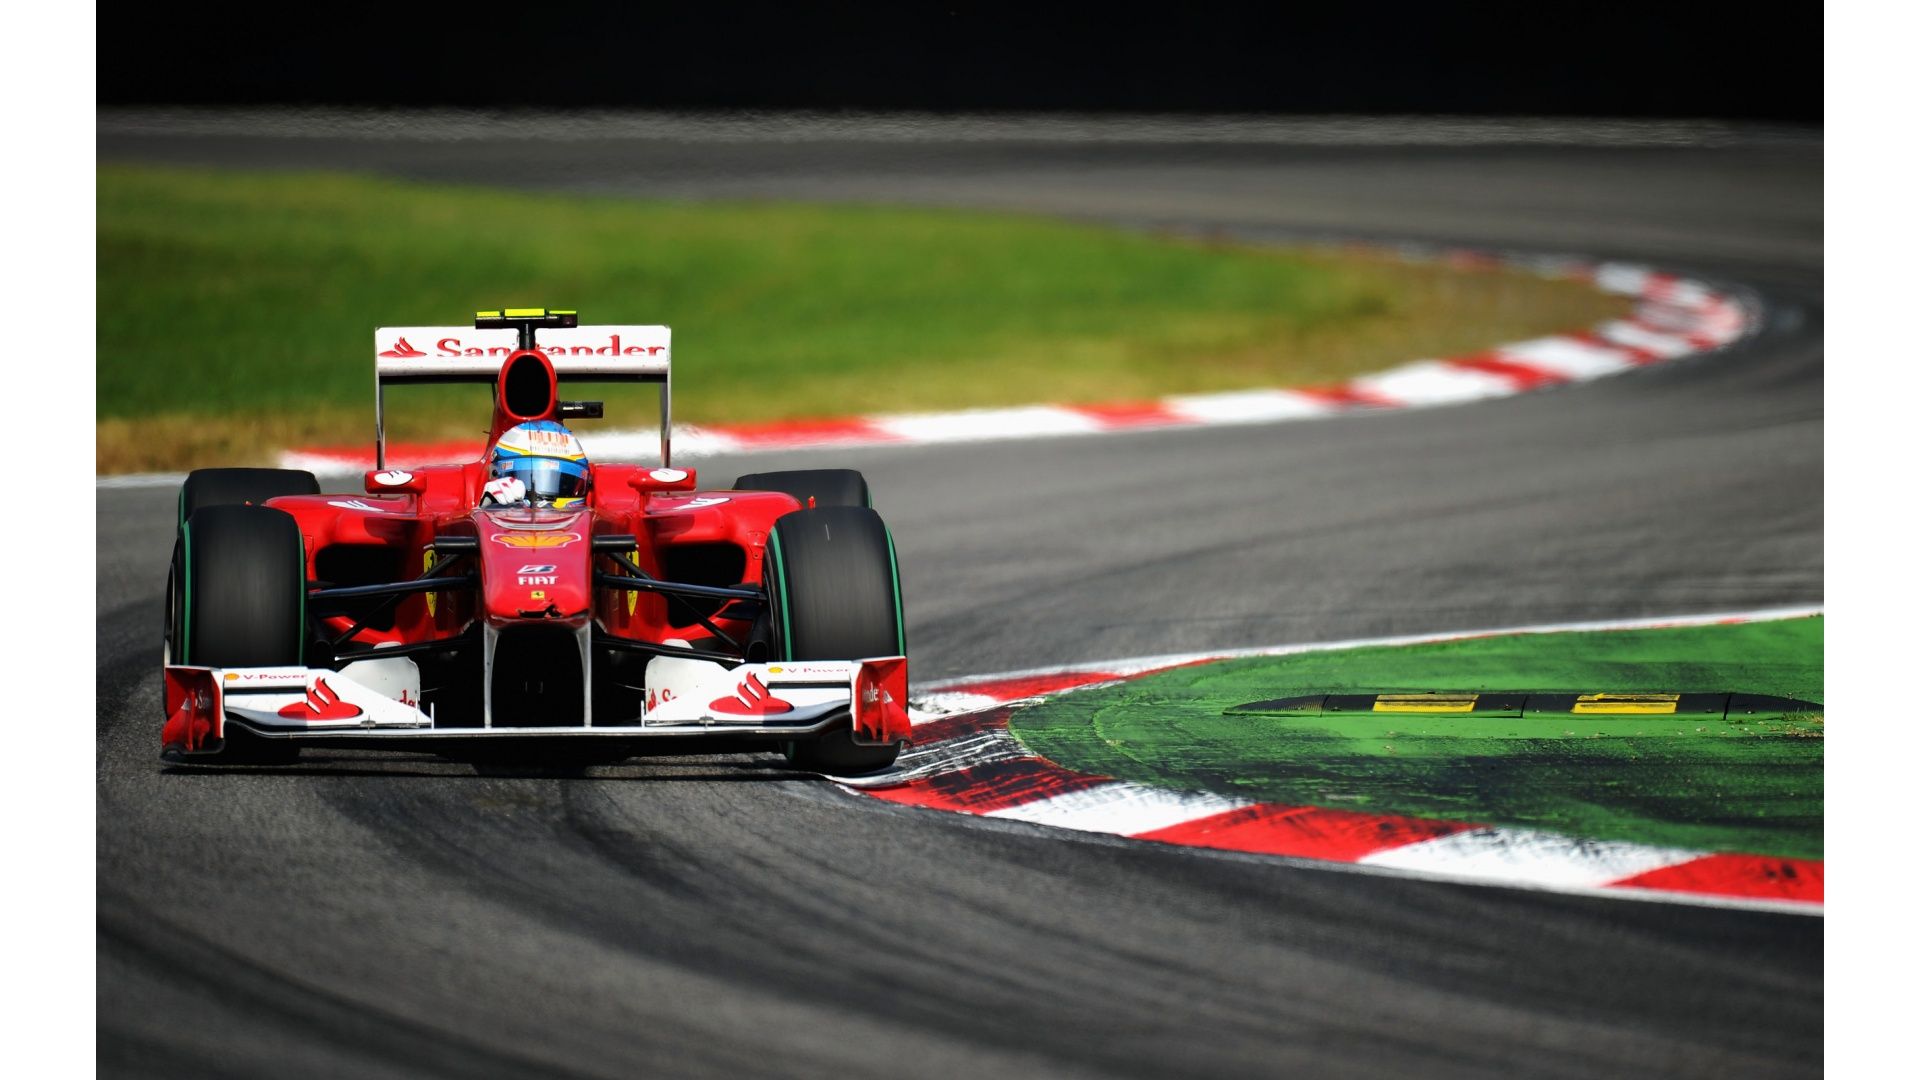 Fernando Alonso Formula Sports HD Wallpapers   1531895 1920x1080